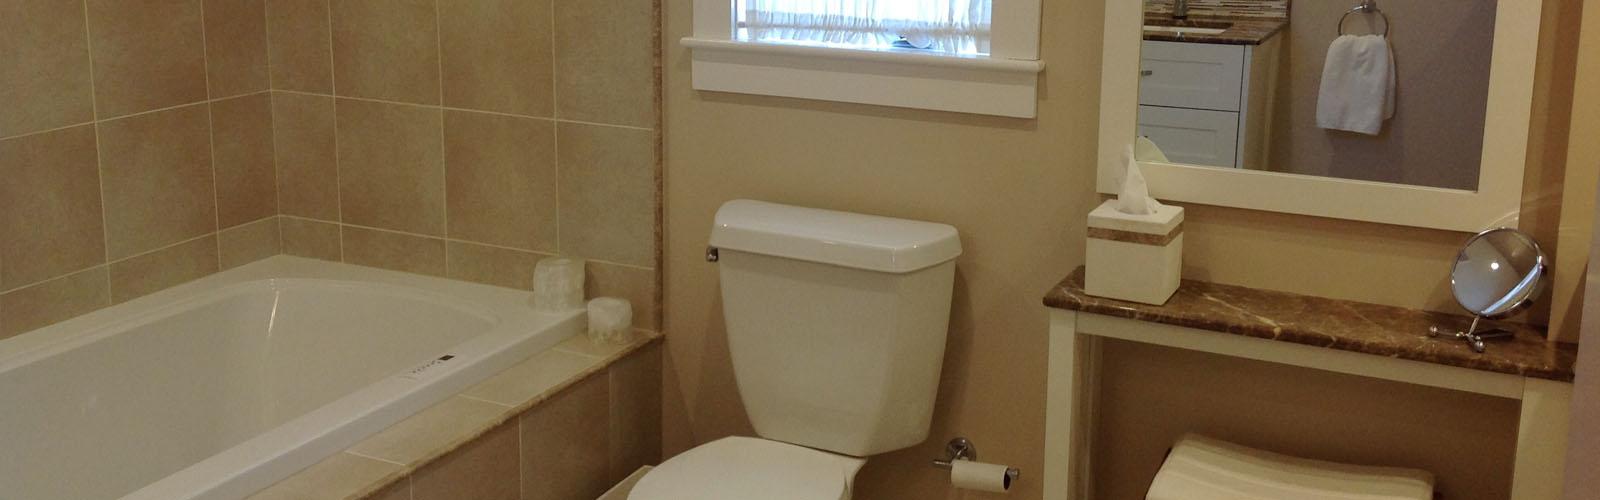 Pease bathtub and vanity